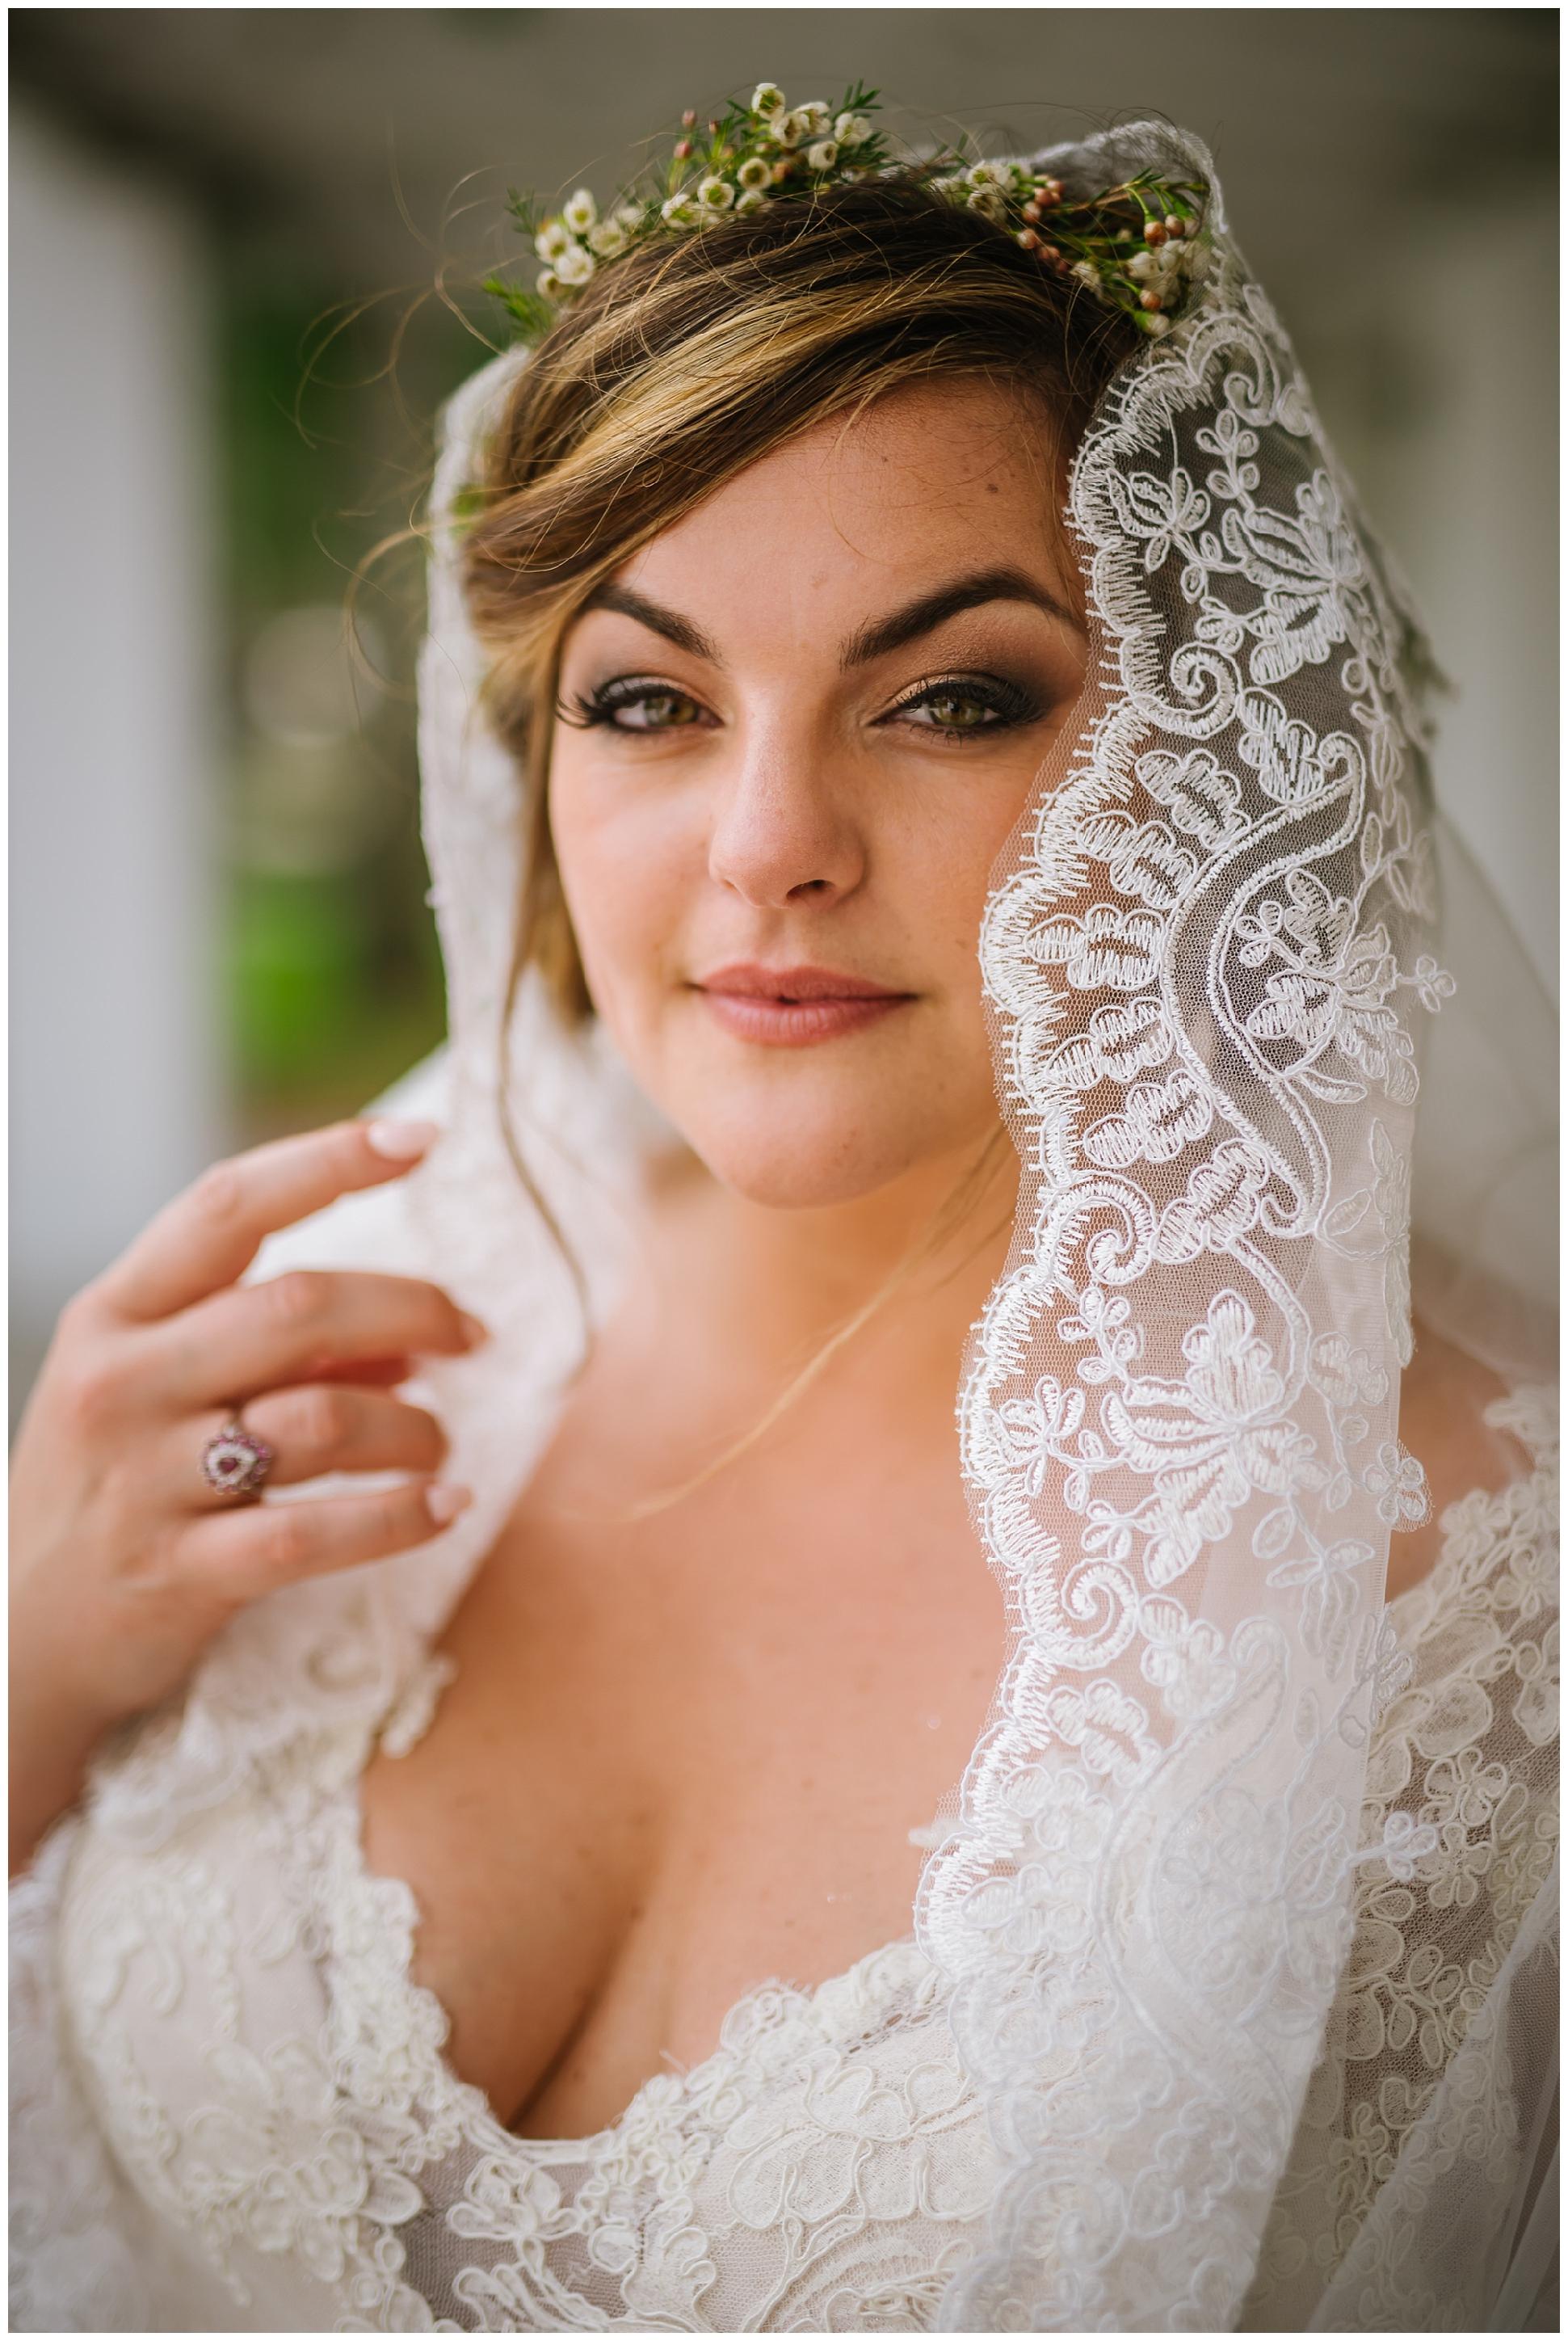 st-pete-wedding-photographer-italian-romance-theme-rustic-flower-crown_0417.jpg